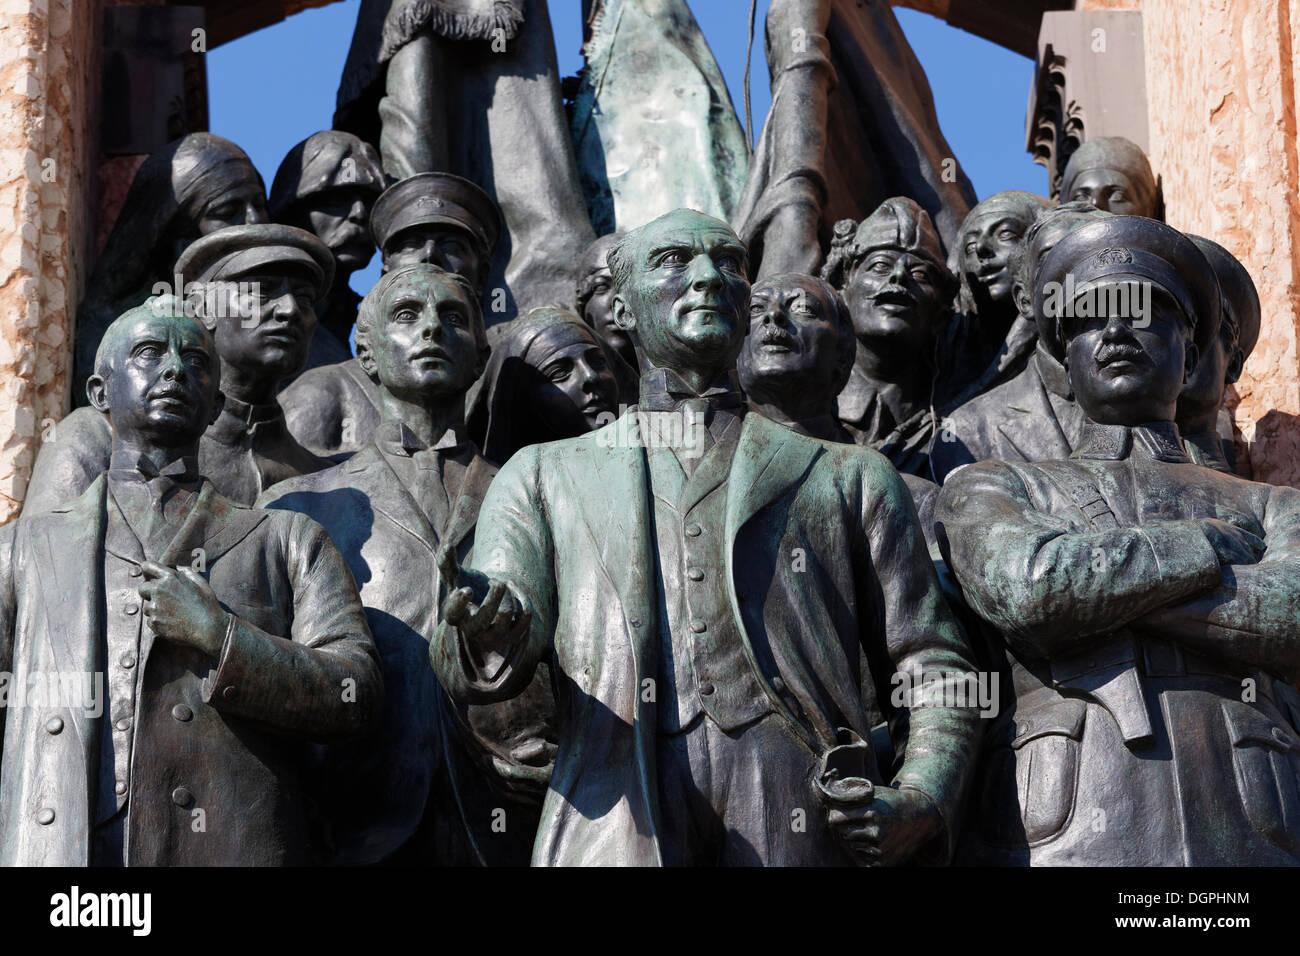 Mustafa Kemal Atatuerk avec camarades, Cumhuriyet Aniti monument, monument de l'indépendance par Pietro Canonica Photo Stock